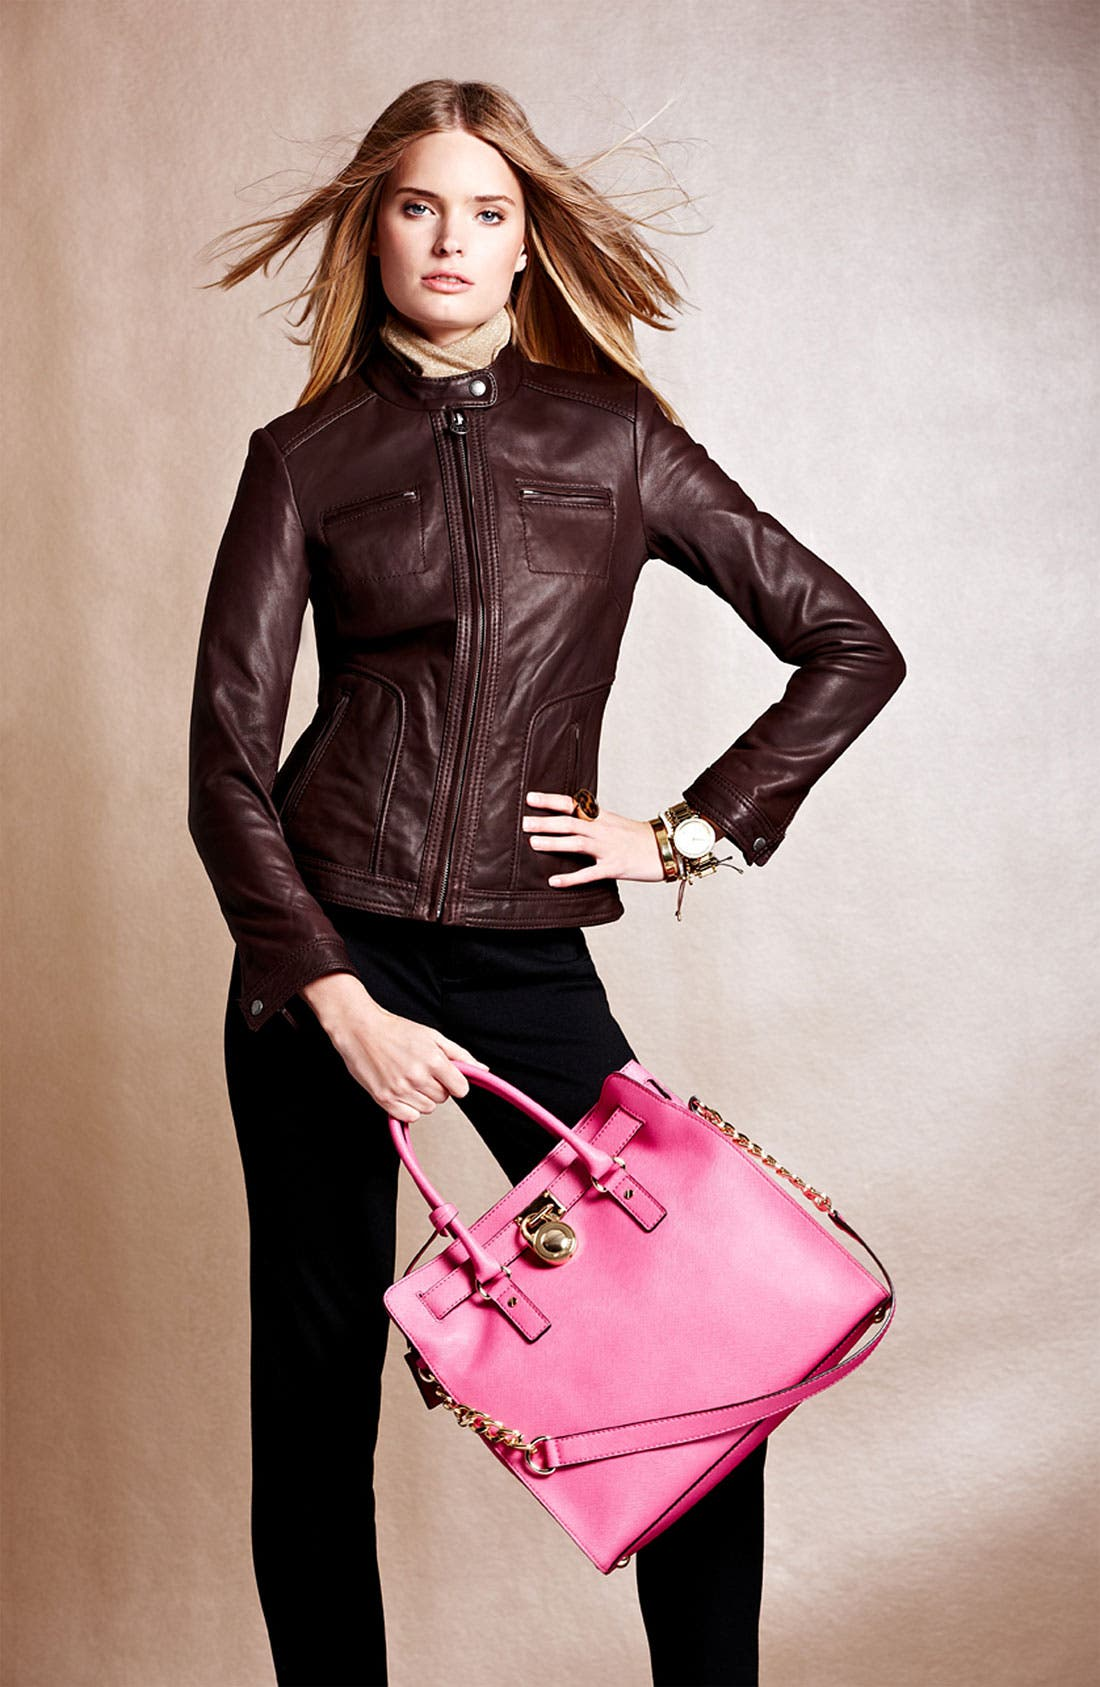 Main Image - MICHAEL Michael Kors Leather Jacket, Pants & Tote